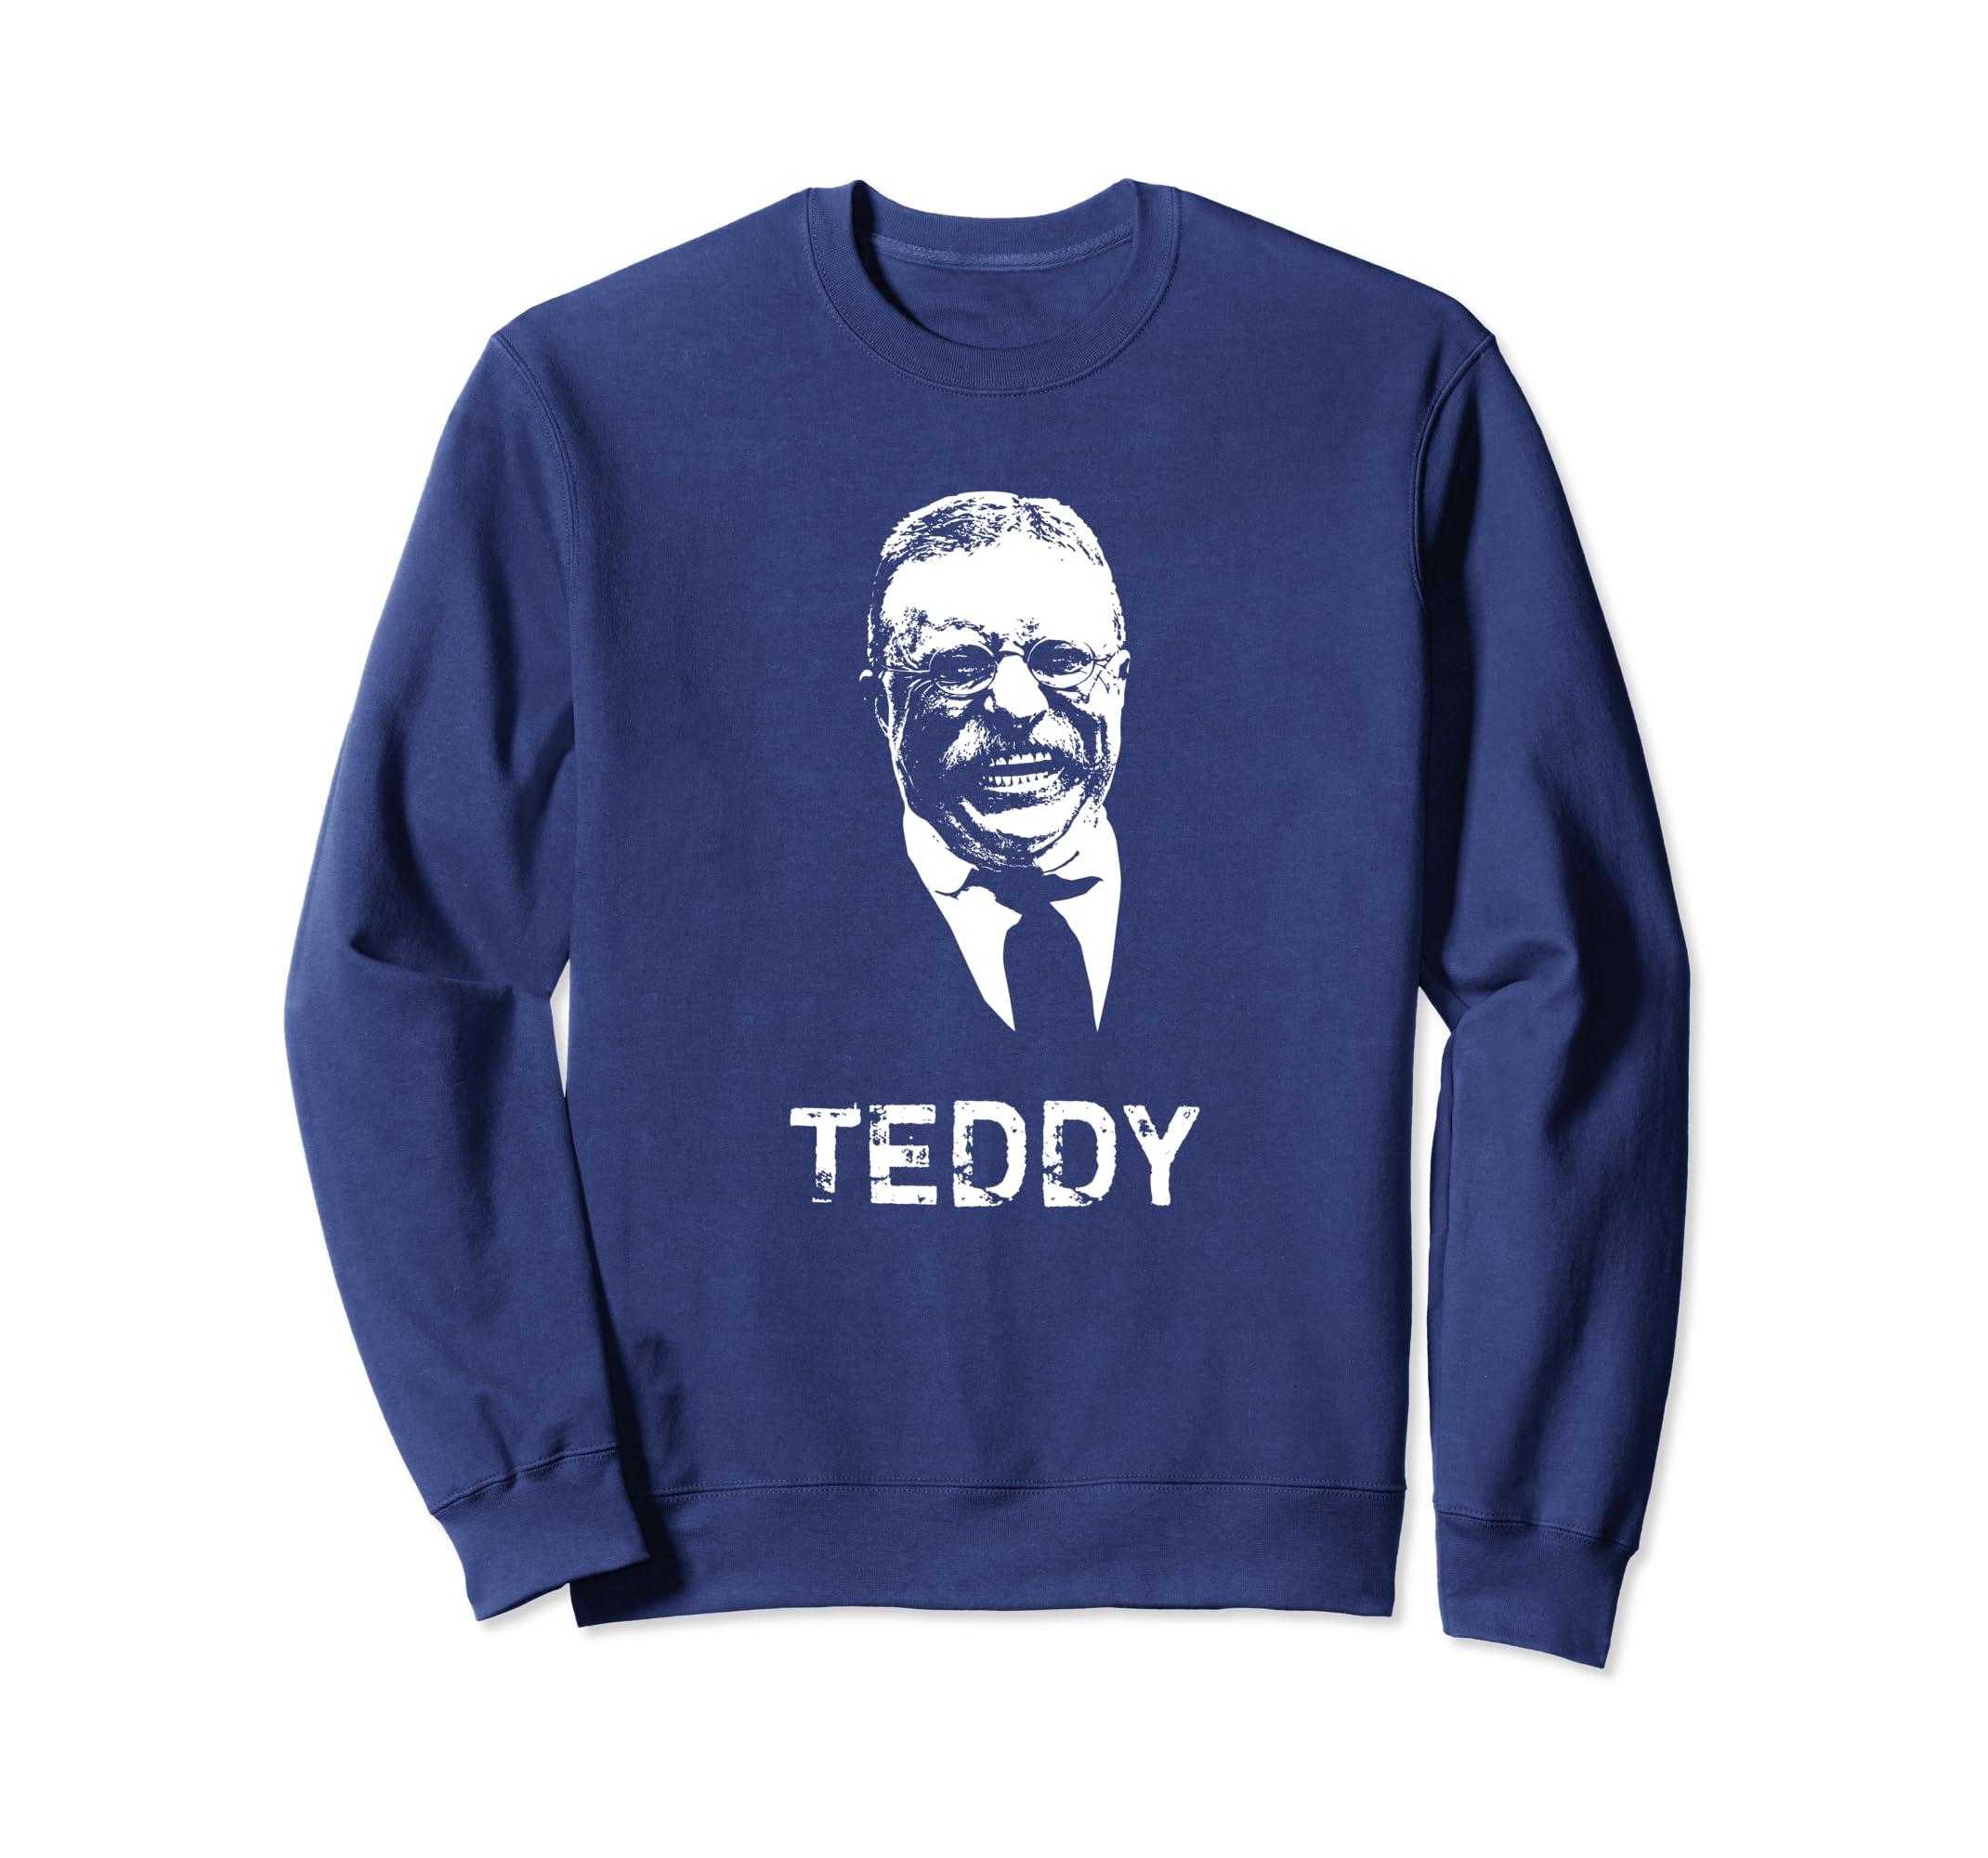 TEDDY – President Theodore Roosevelt Sweatshirt-Teehay